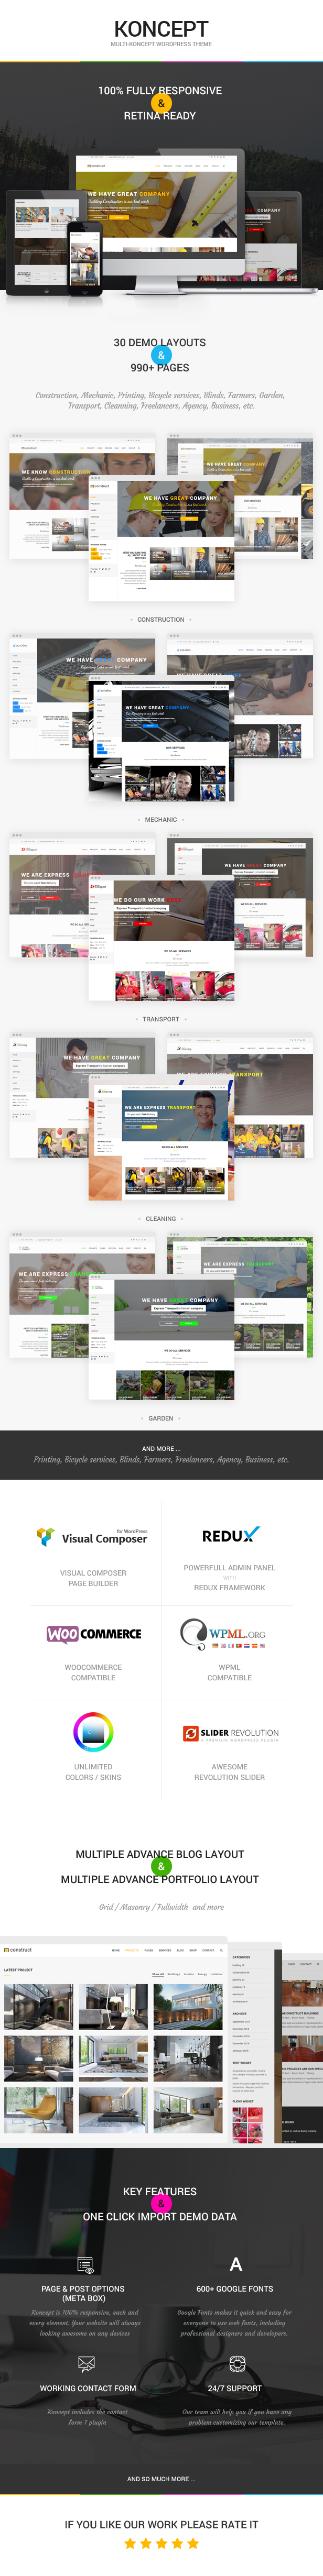 Koncept - Responsive Multi-Concept Wordpress Theme - 1